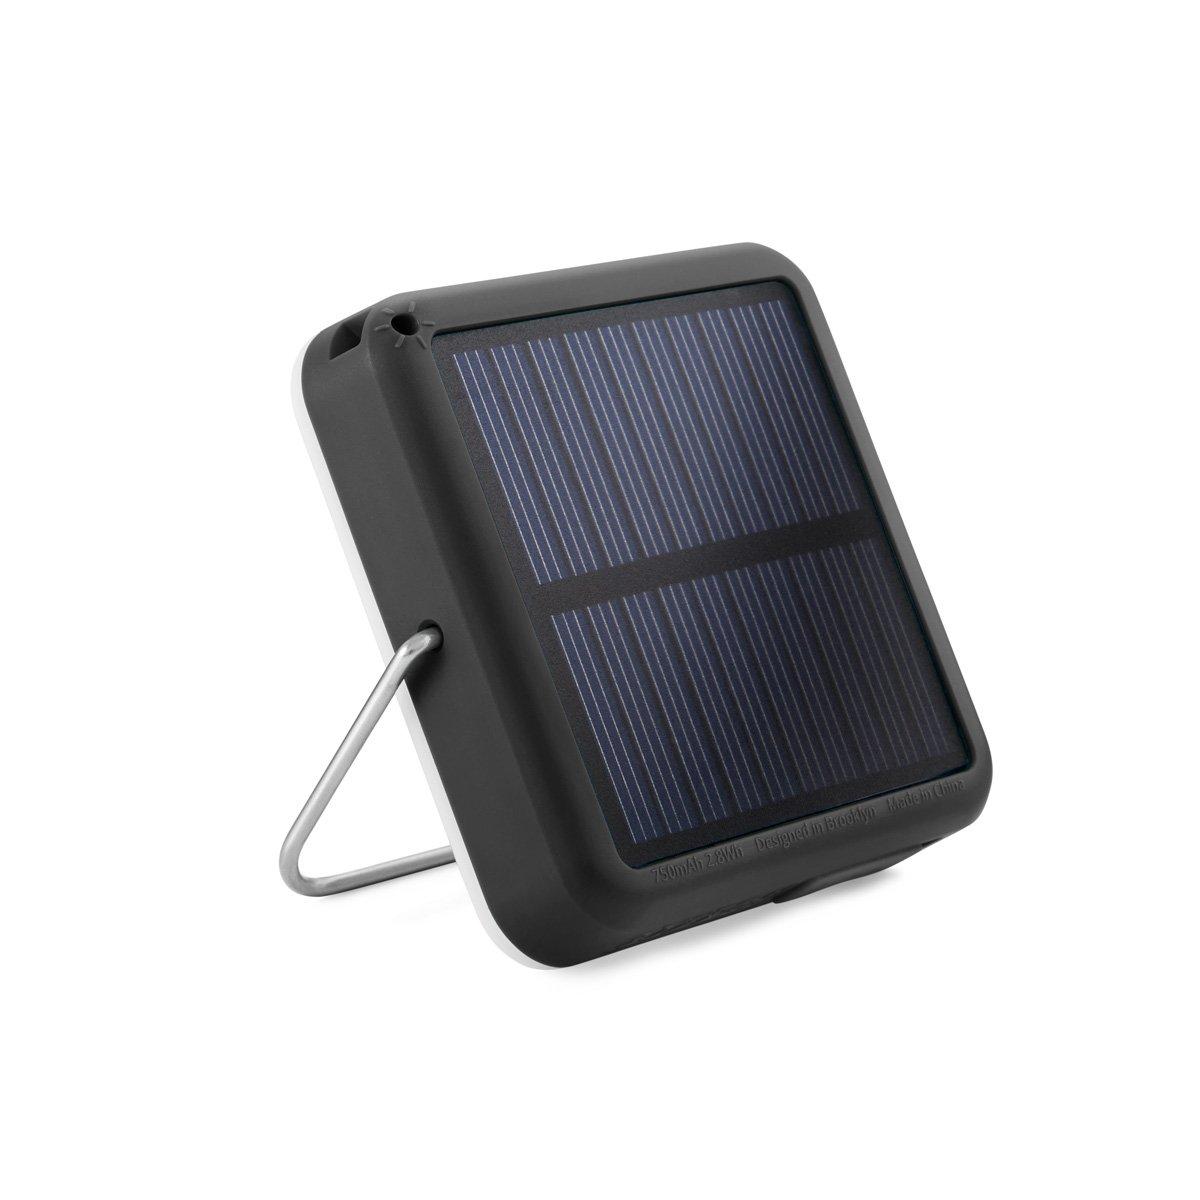 BioLite Sunlight Solar Powered Lantern, Grey by BioLite (Image #2)